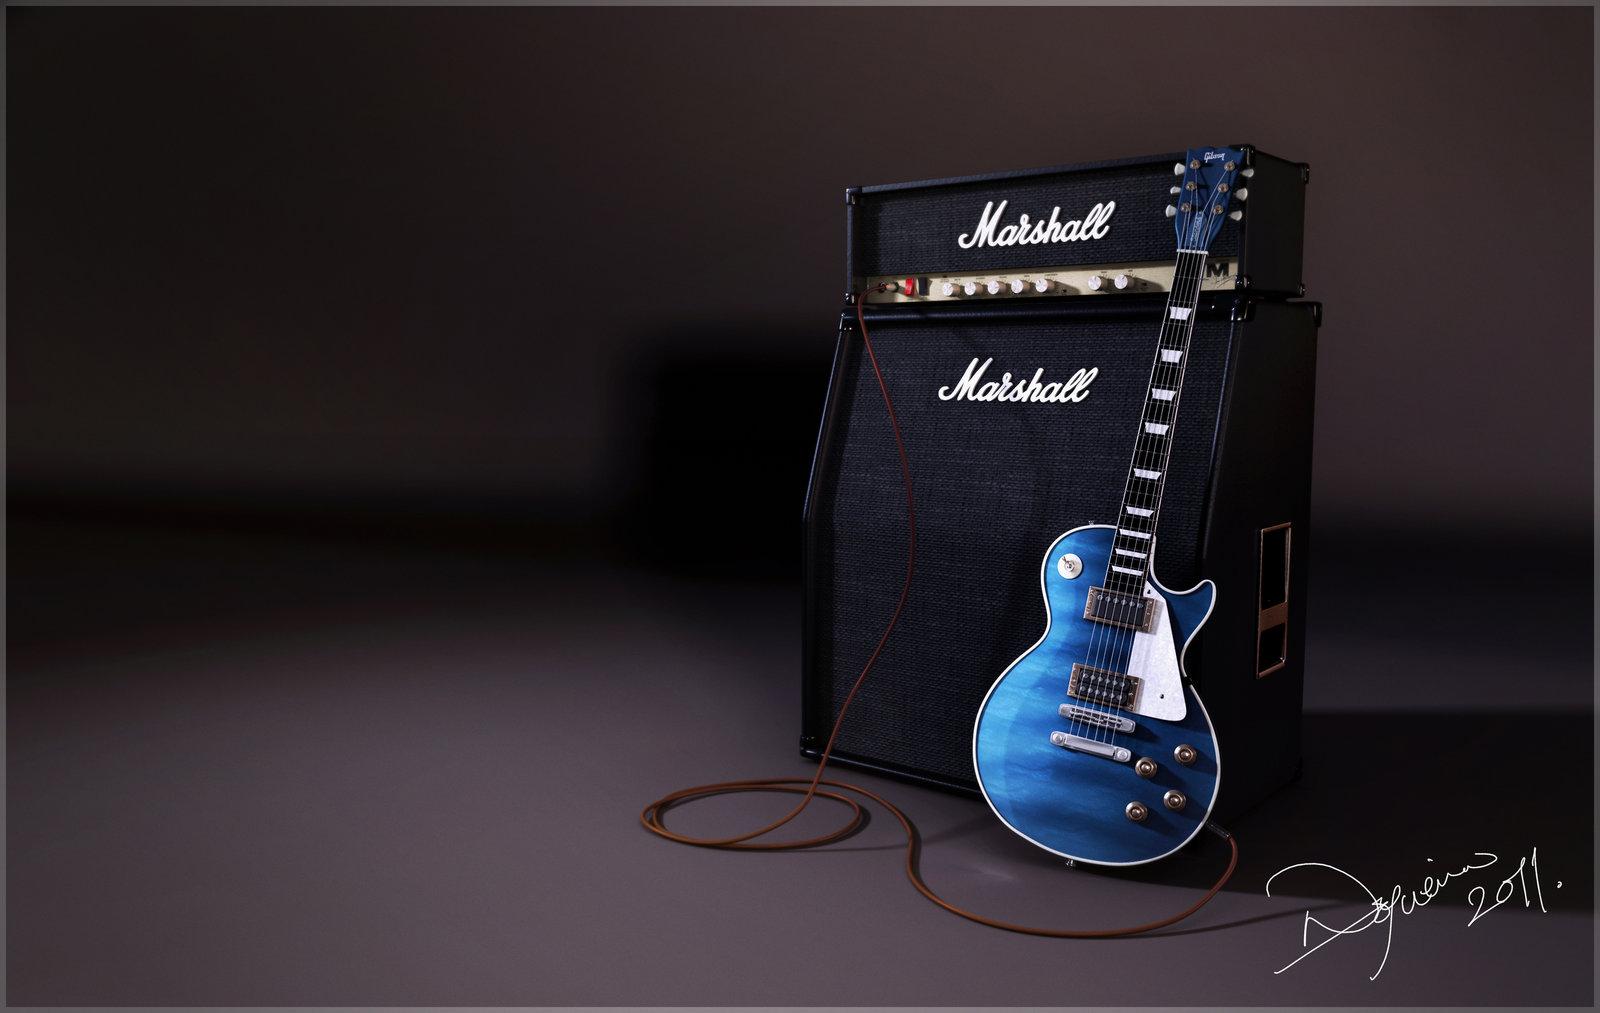 49 gibson guitar wallpaper hd on wallpapersafari - Free guitar wallpapers for pc ...